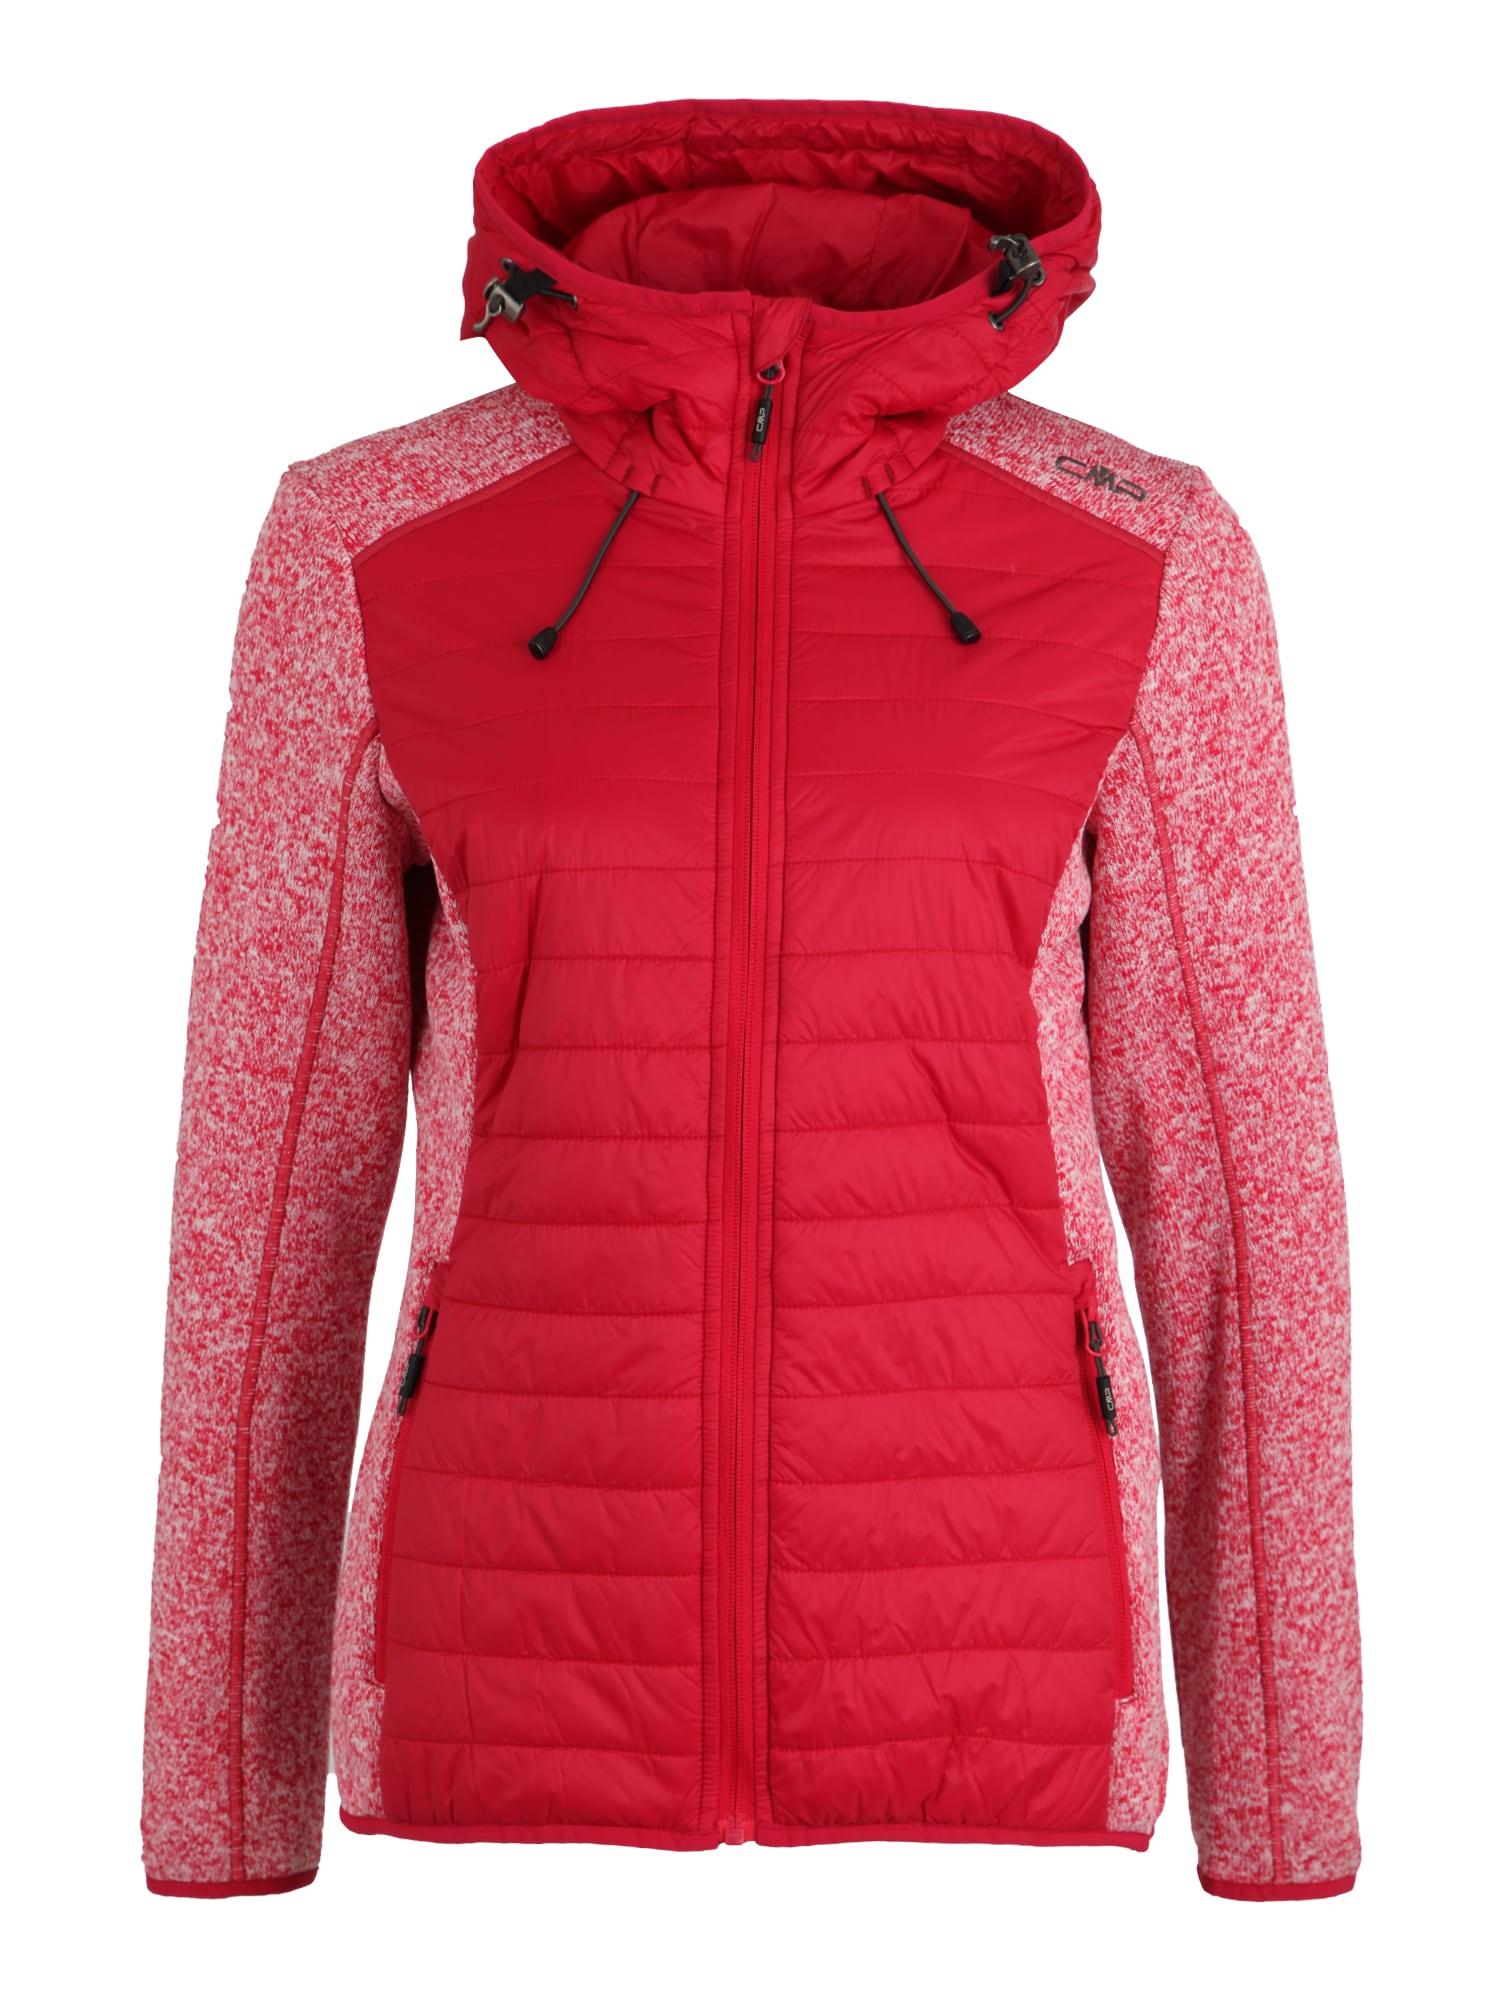 Outdoorová bunda HYBRID červená CMP